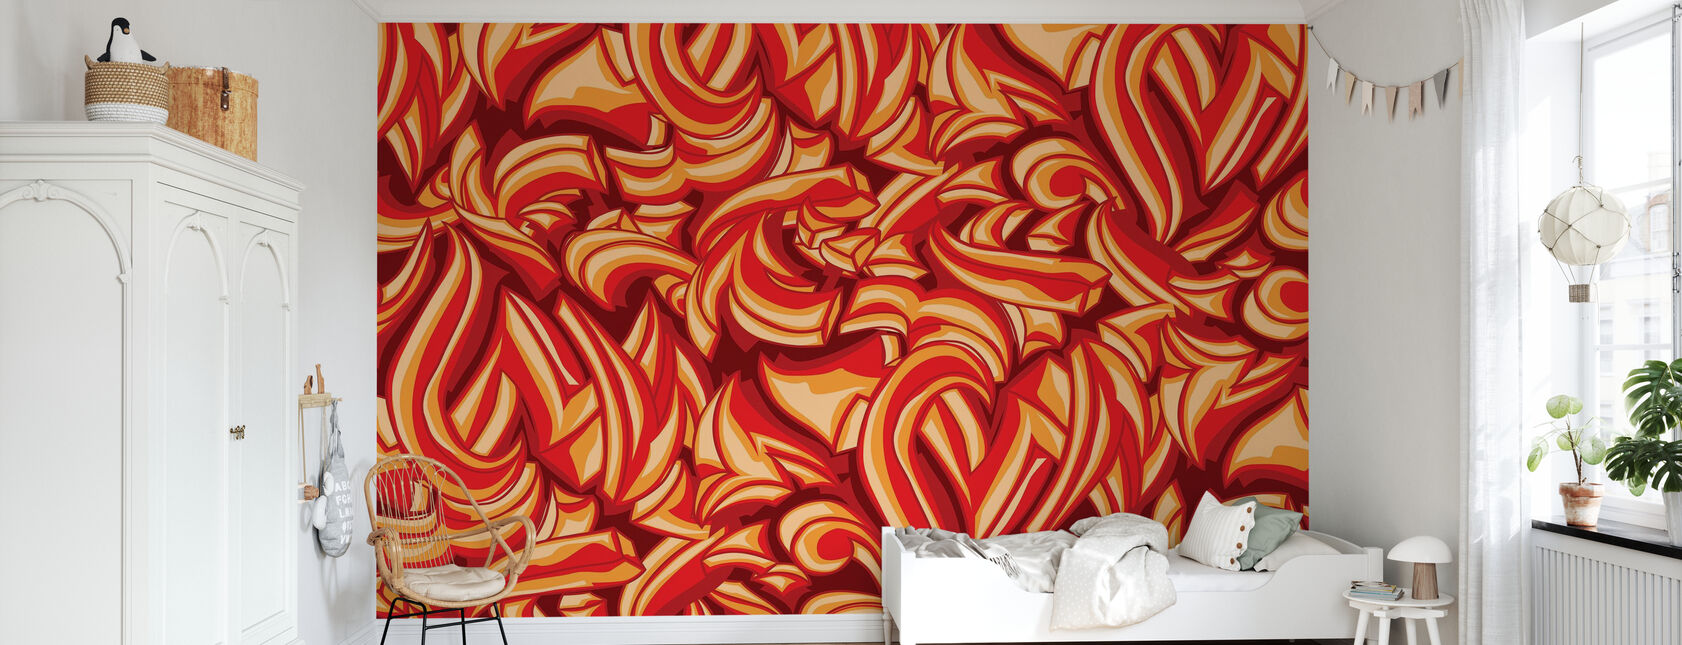 Skitse Splat Graffiti - Tapet - Børneværelse